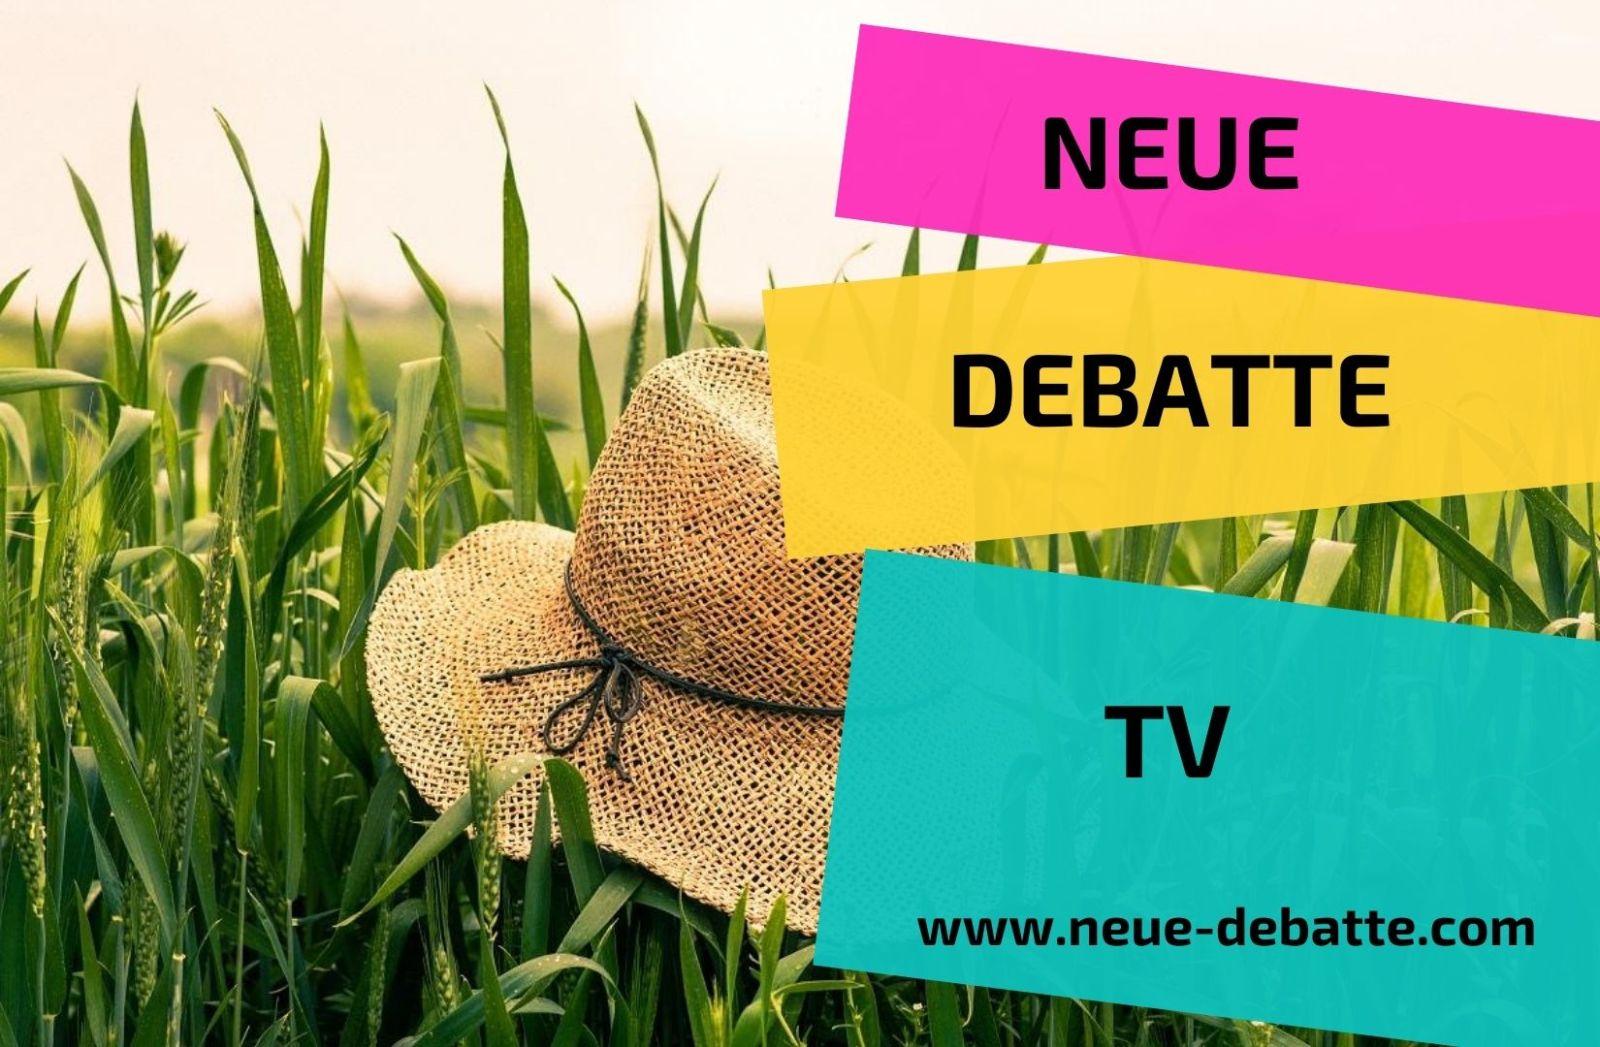 Neue Debatte TV